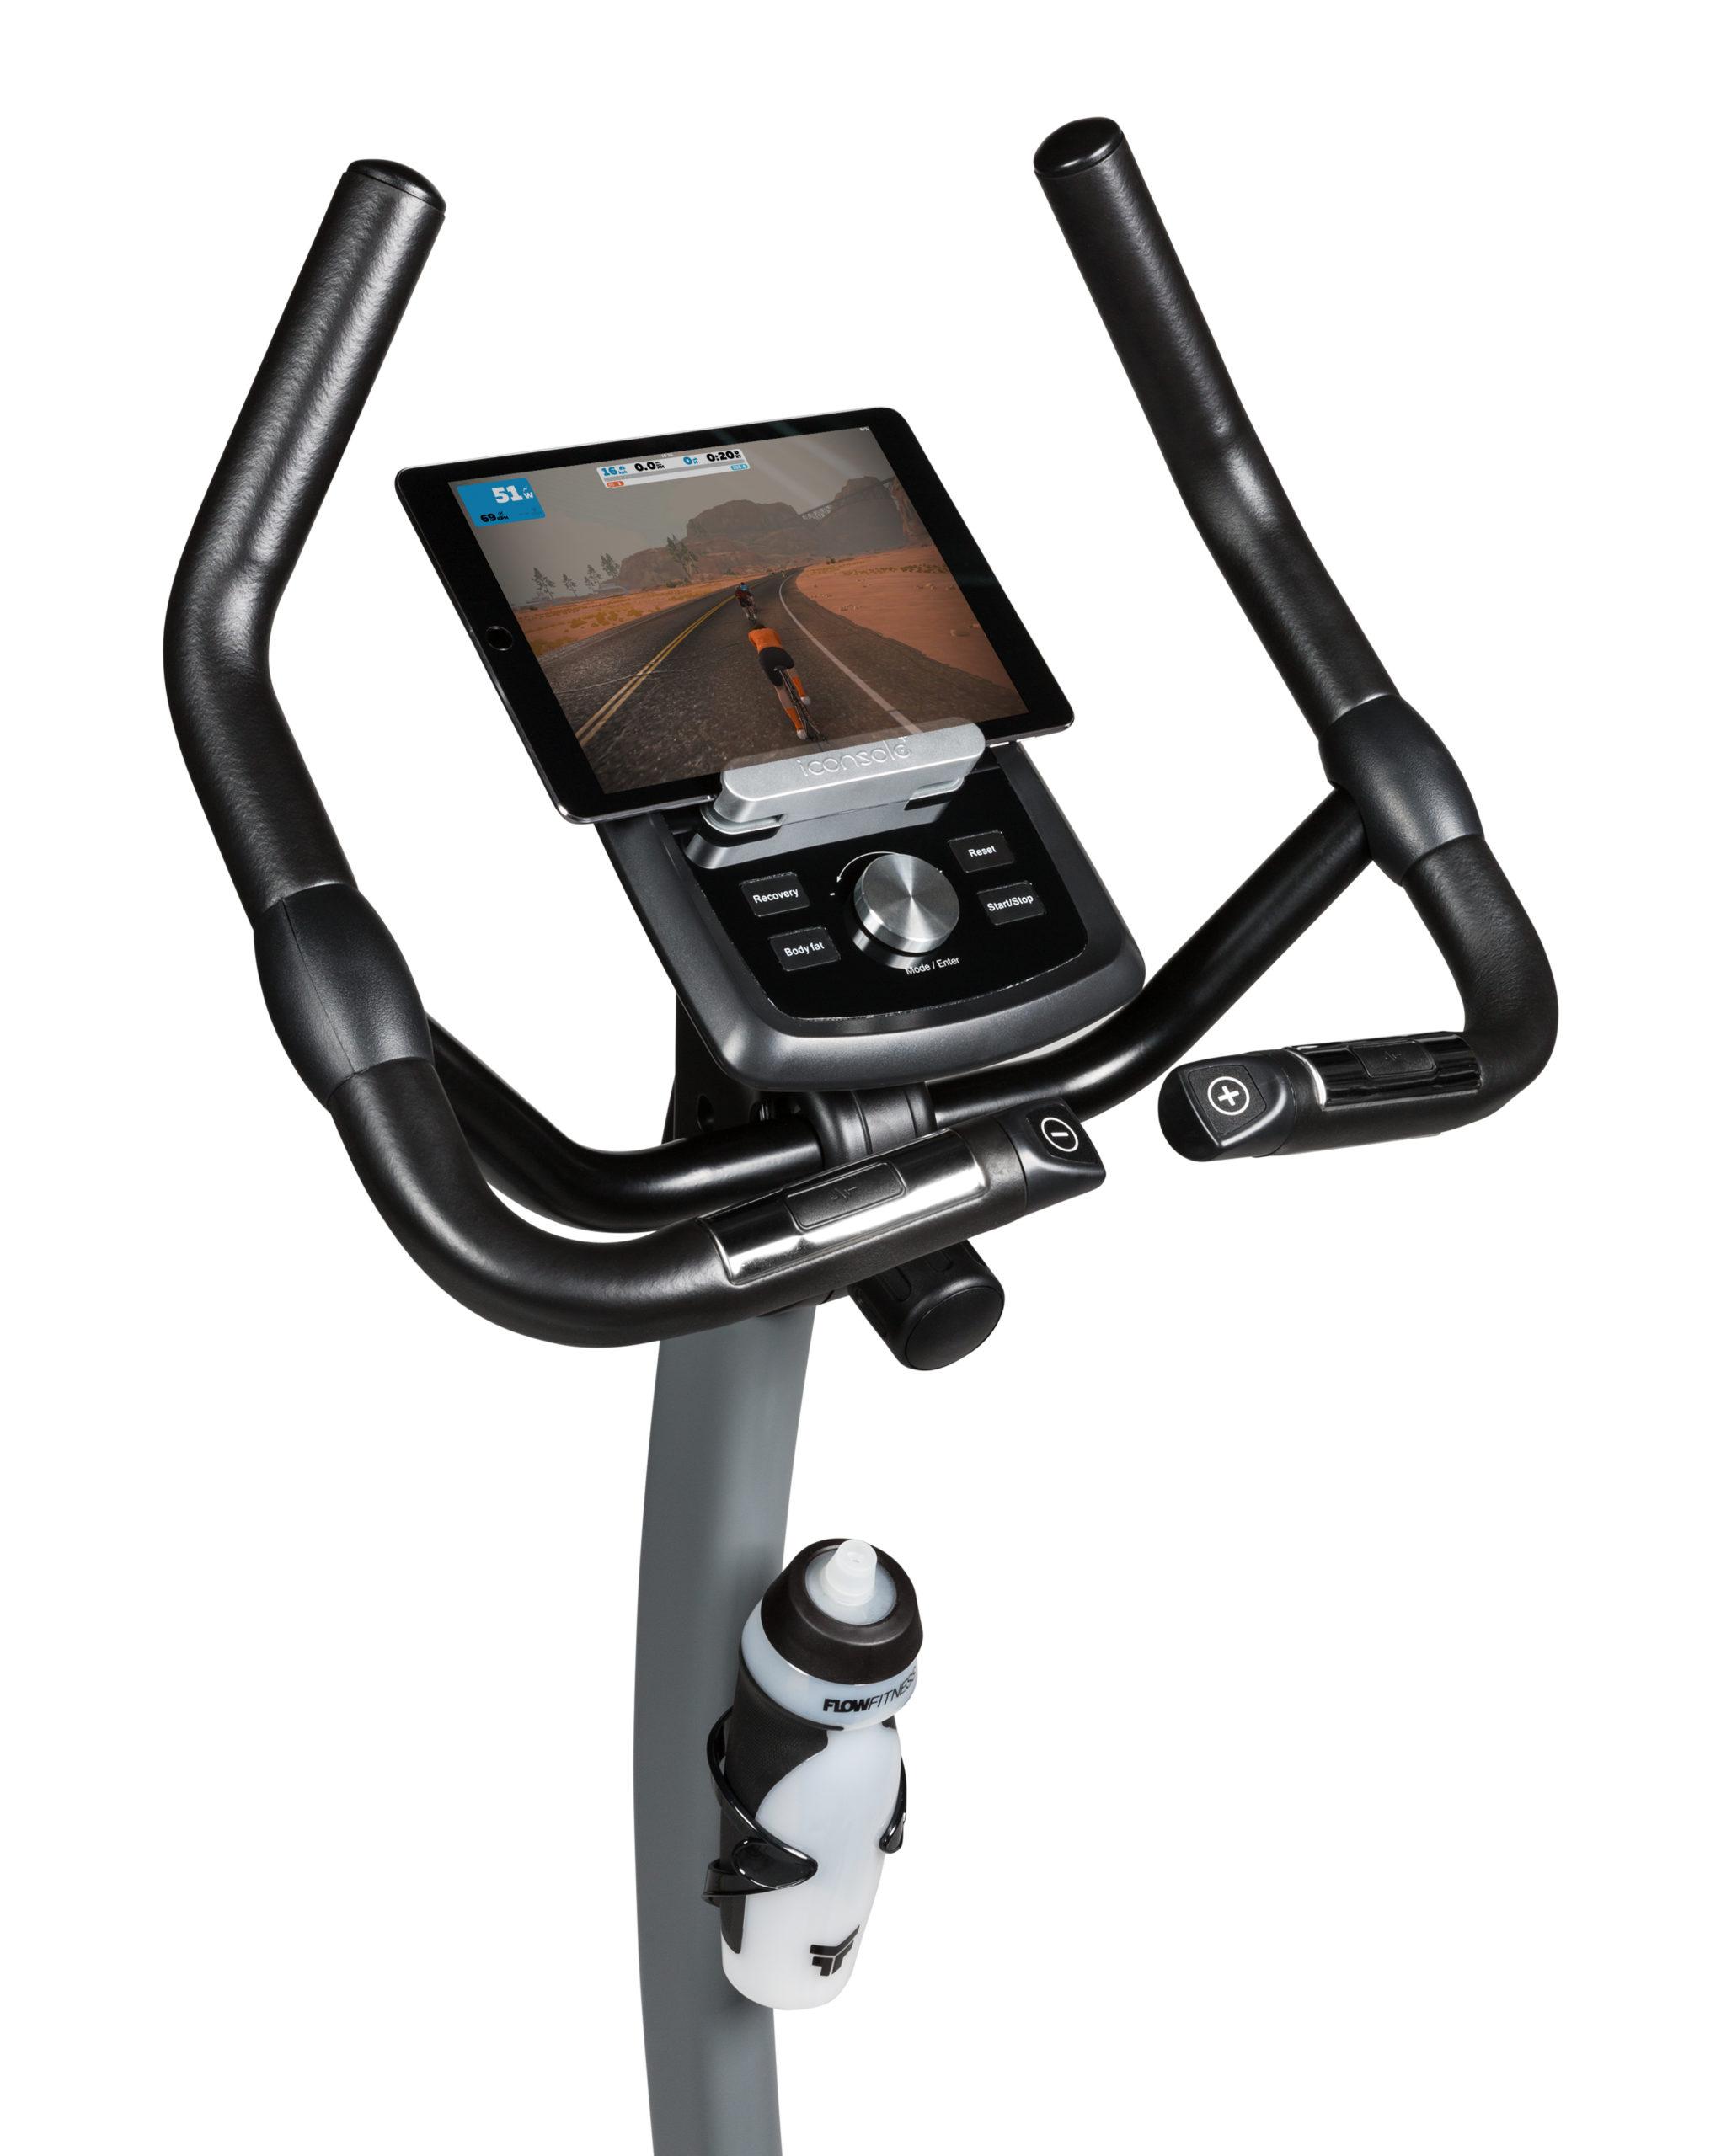 Flow Fitness Tabel Turner DHT2500i Hometrainer 25